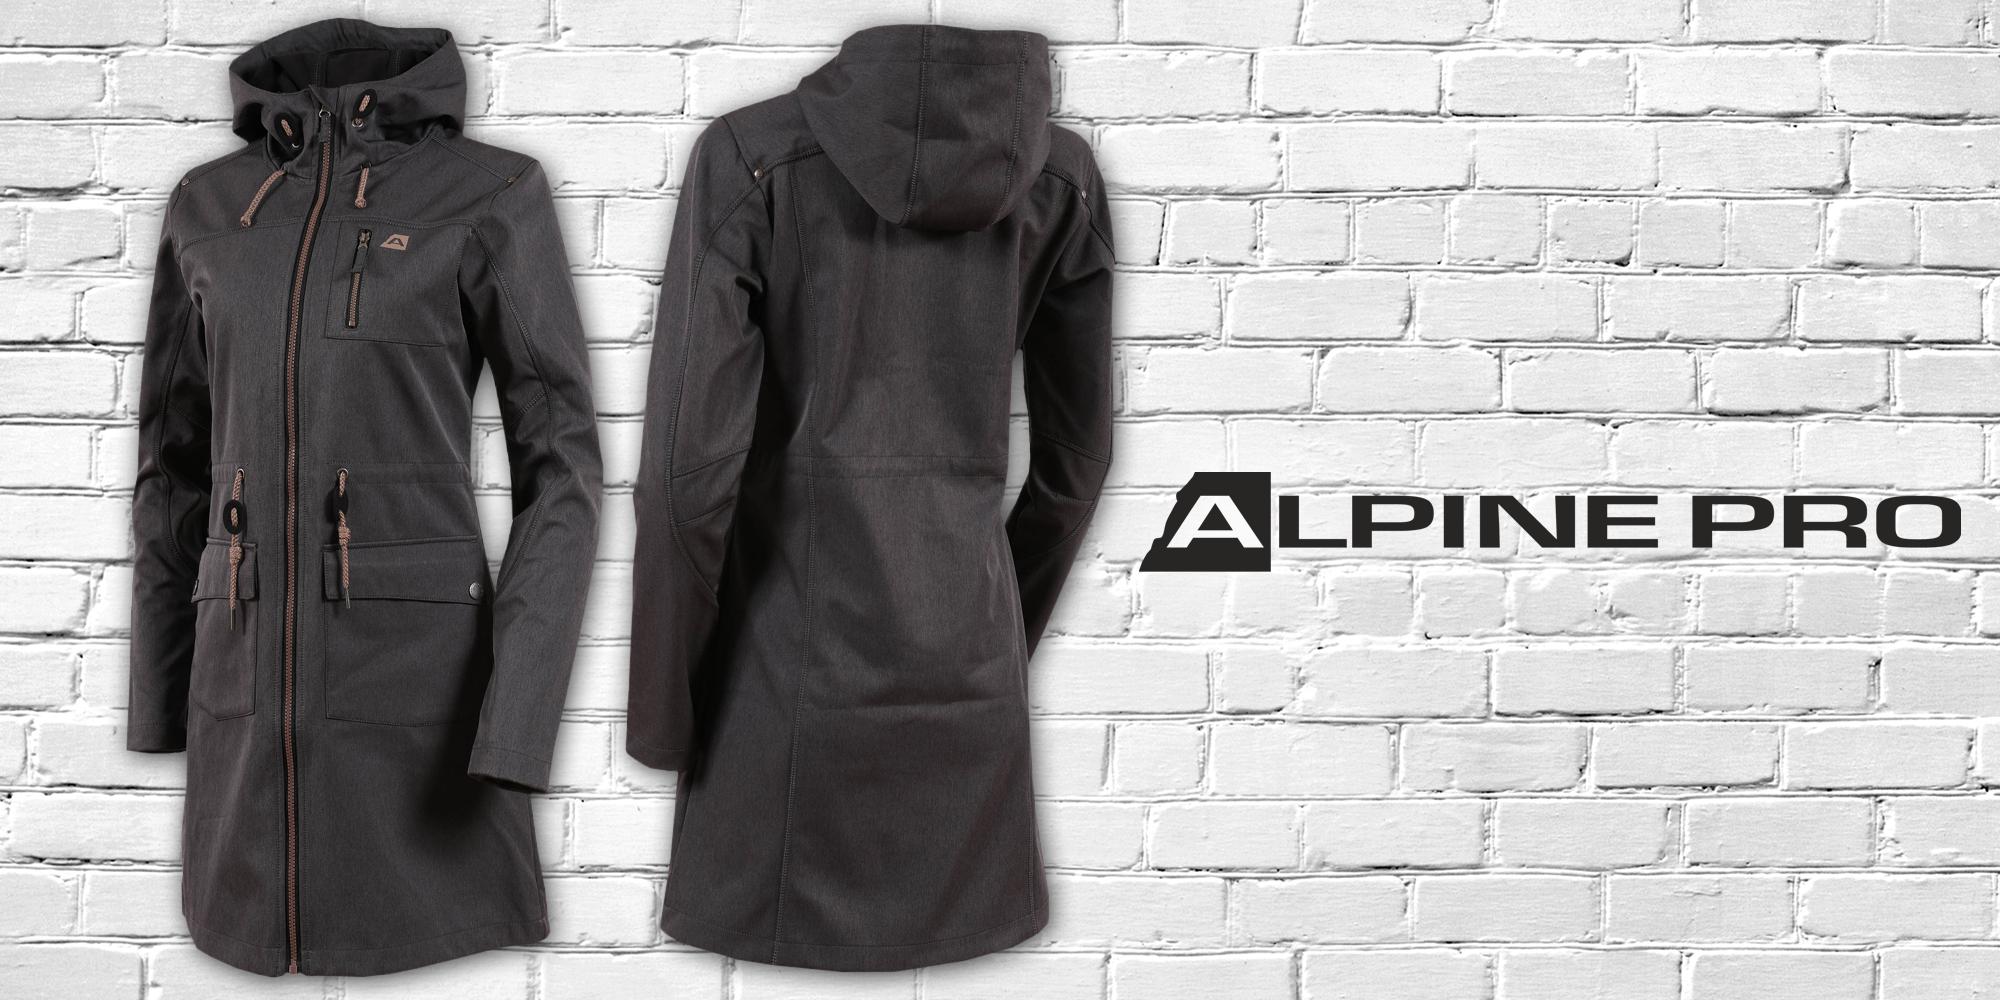 Dámsky softshellový kabát Alpine Pro  5b55f202ba1